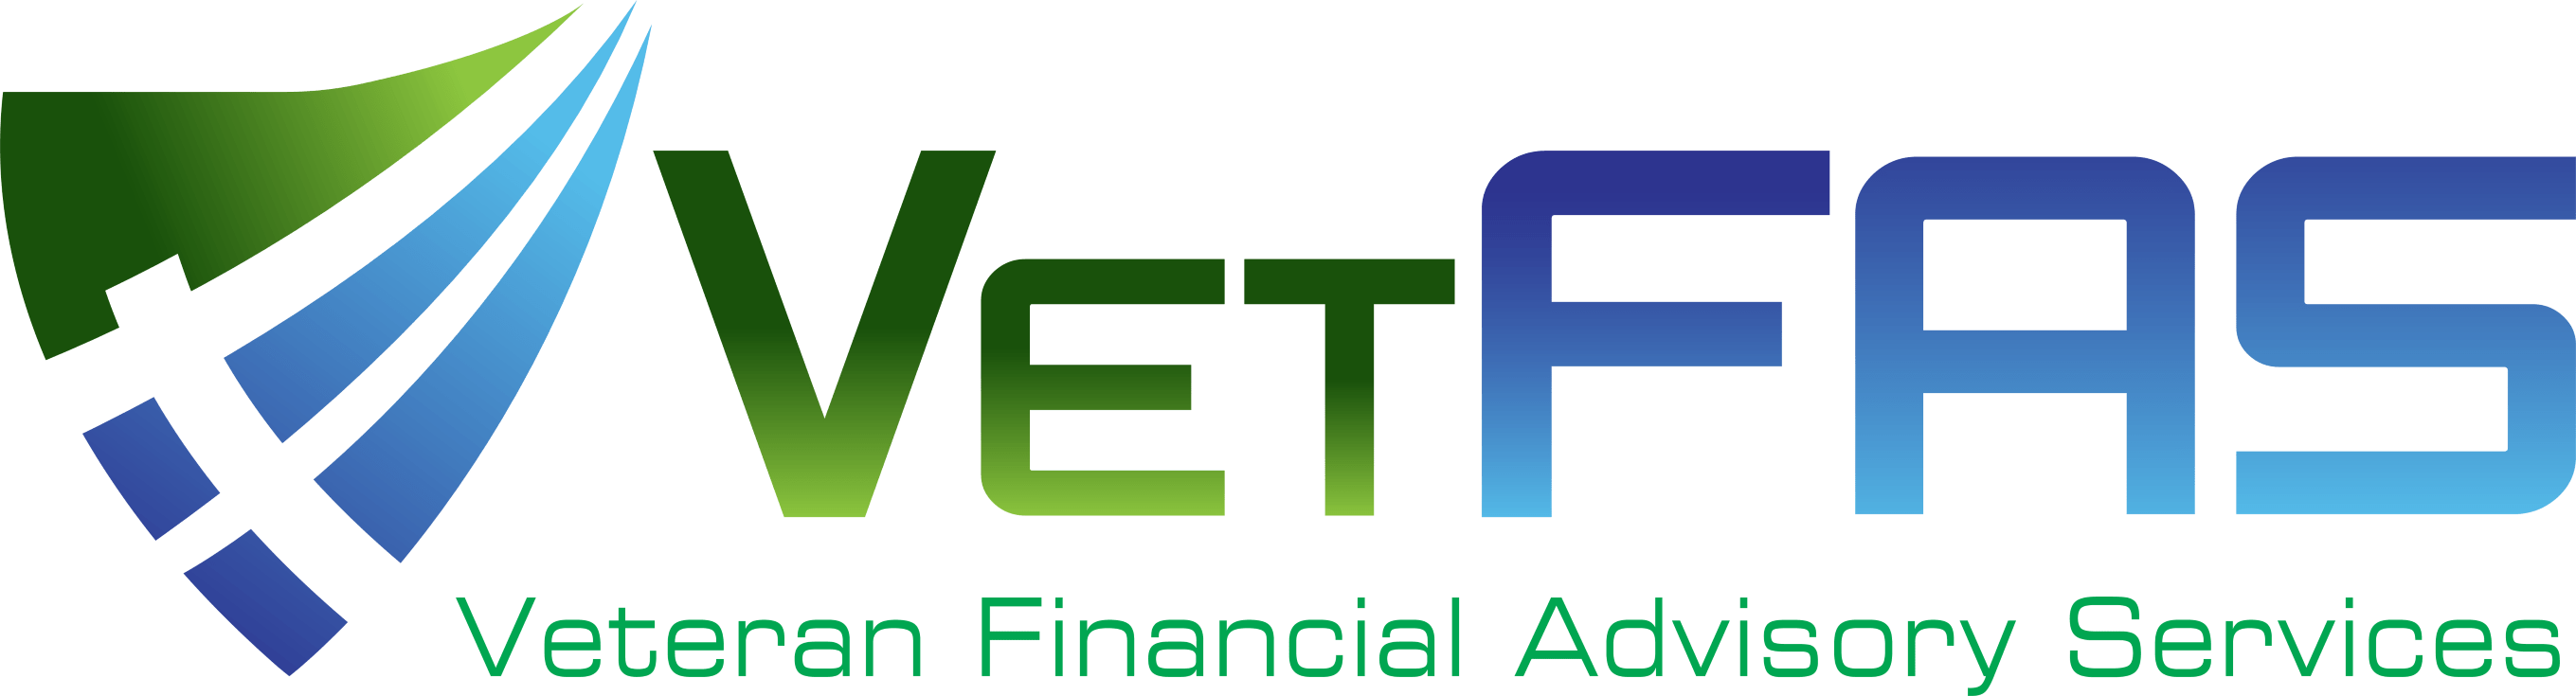 VetFAS | Veteran Financial Advisory Services